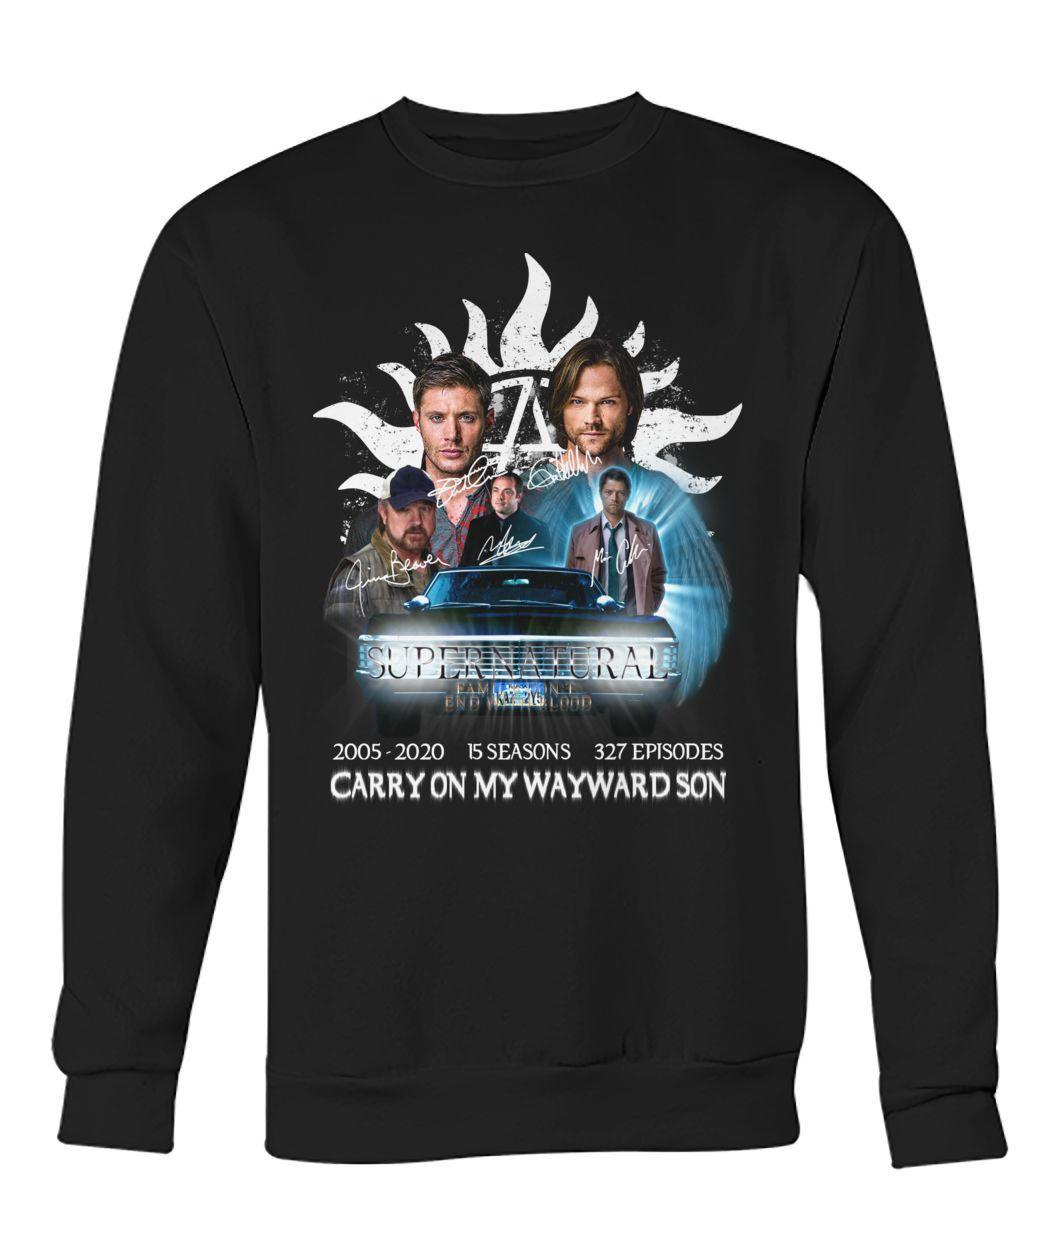 Supernatural 2005 2020 15 seasons 327 episodes Carry on my Wayward Son Sweater